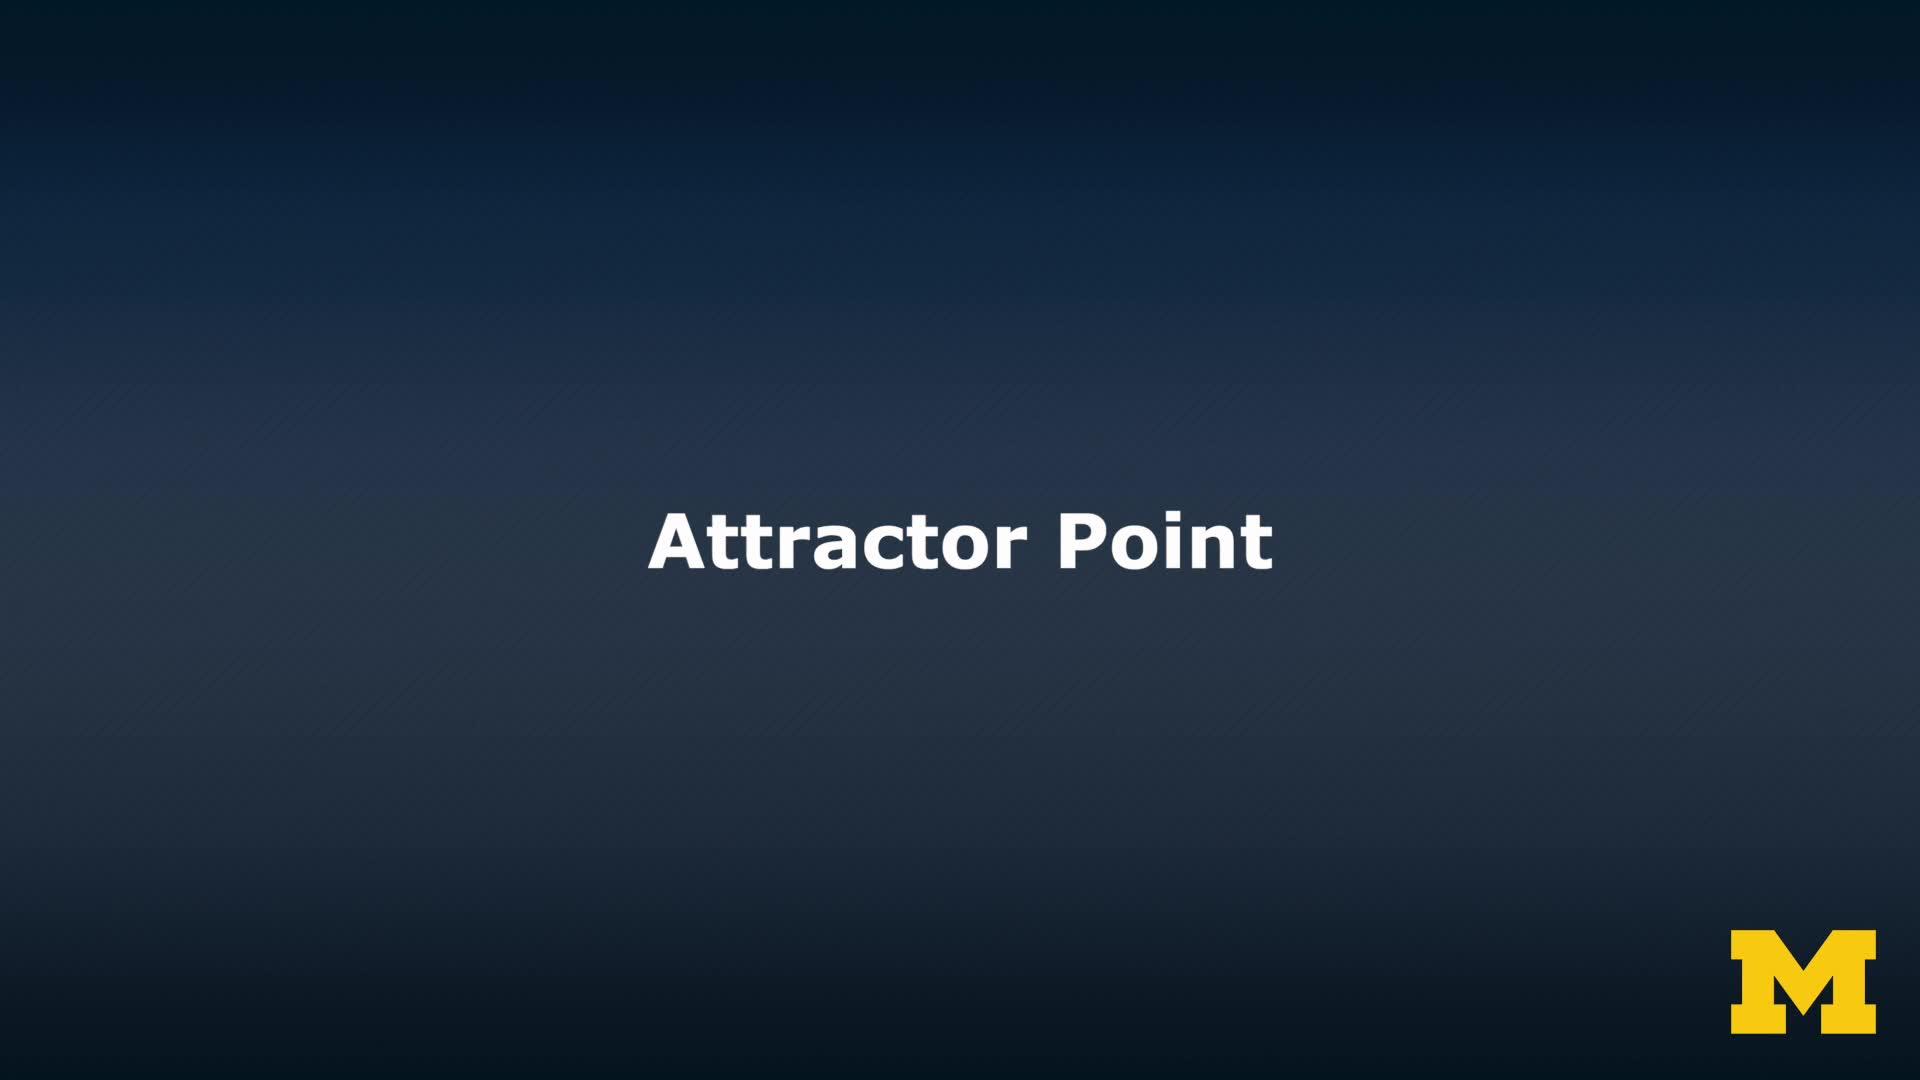 attractor point